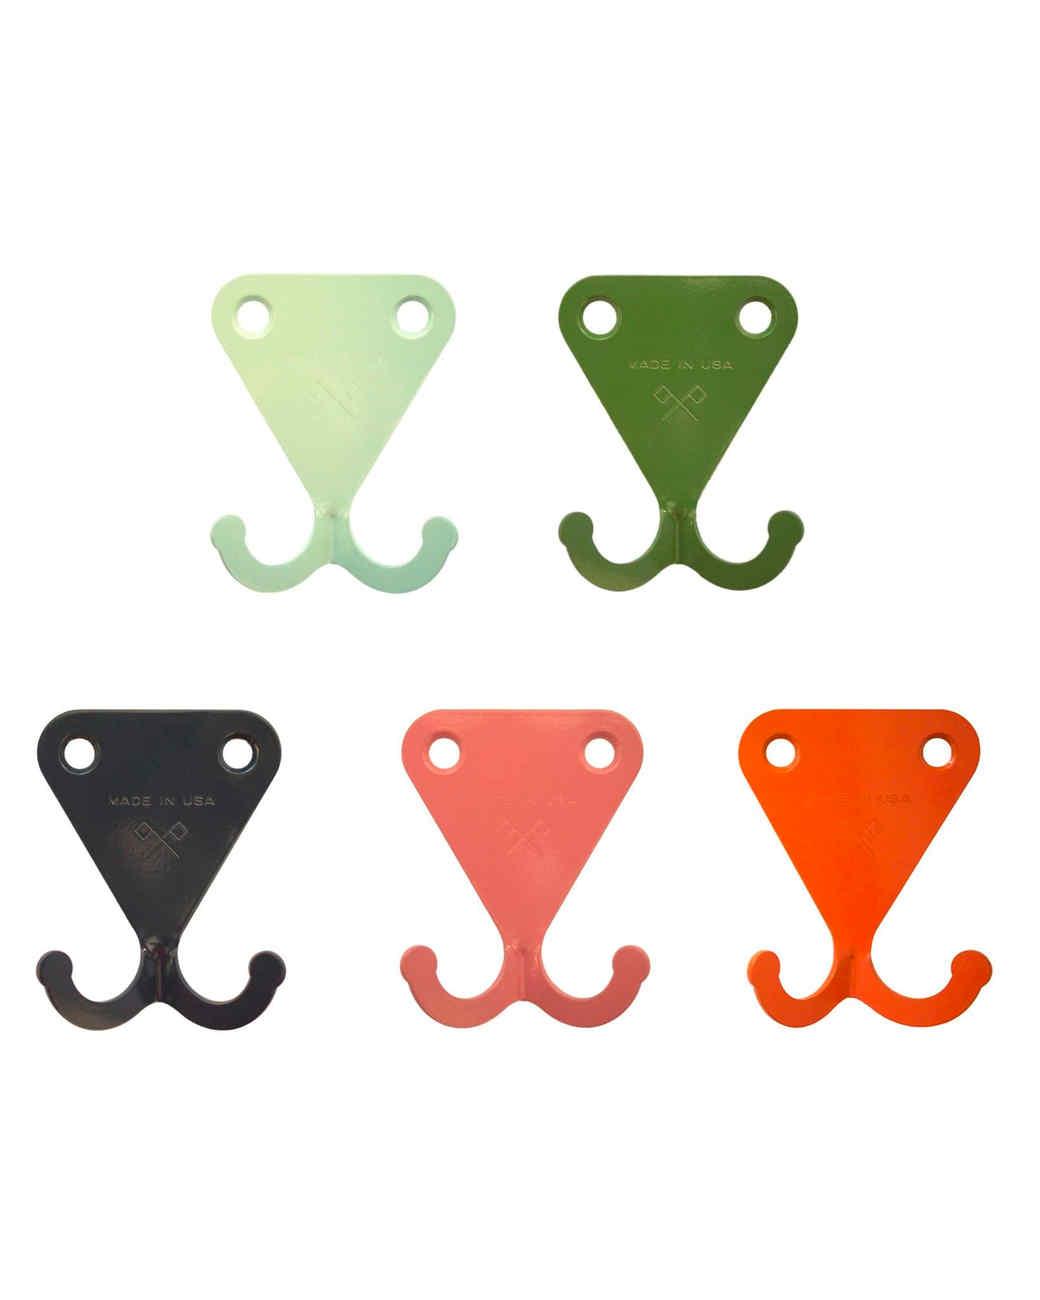 scout-regalia-sr-wall-hook-5-colors-0914.jpg